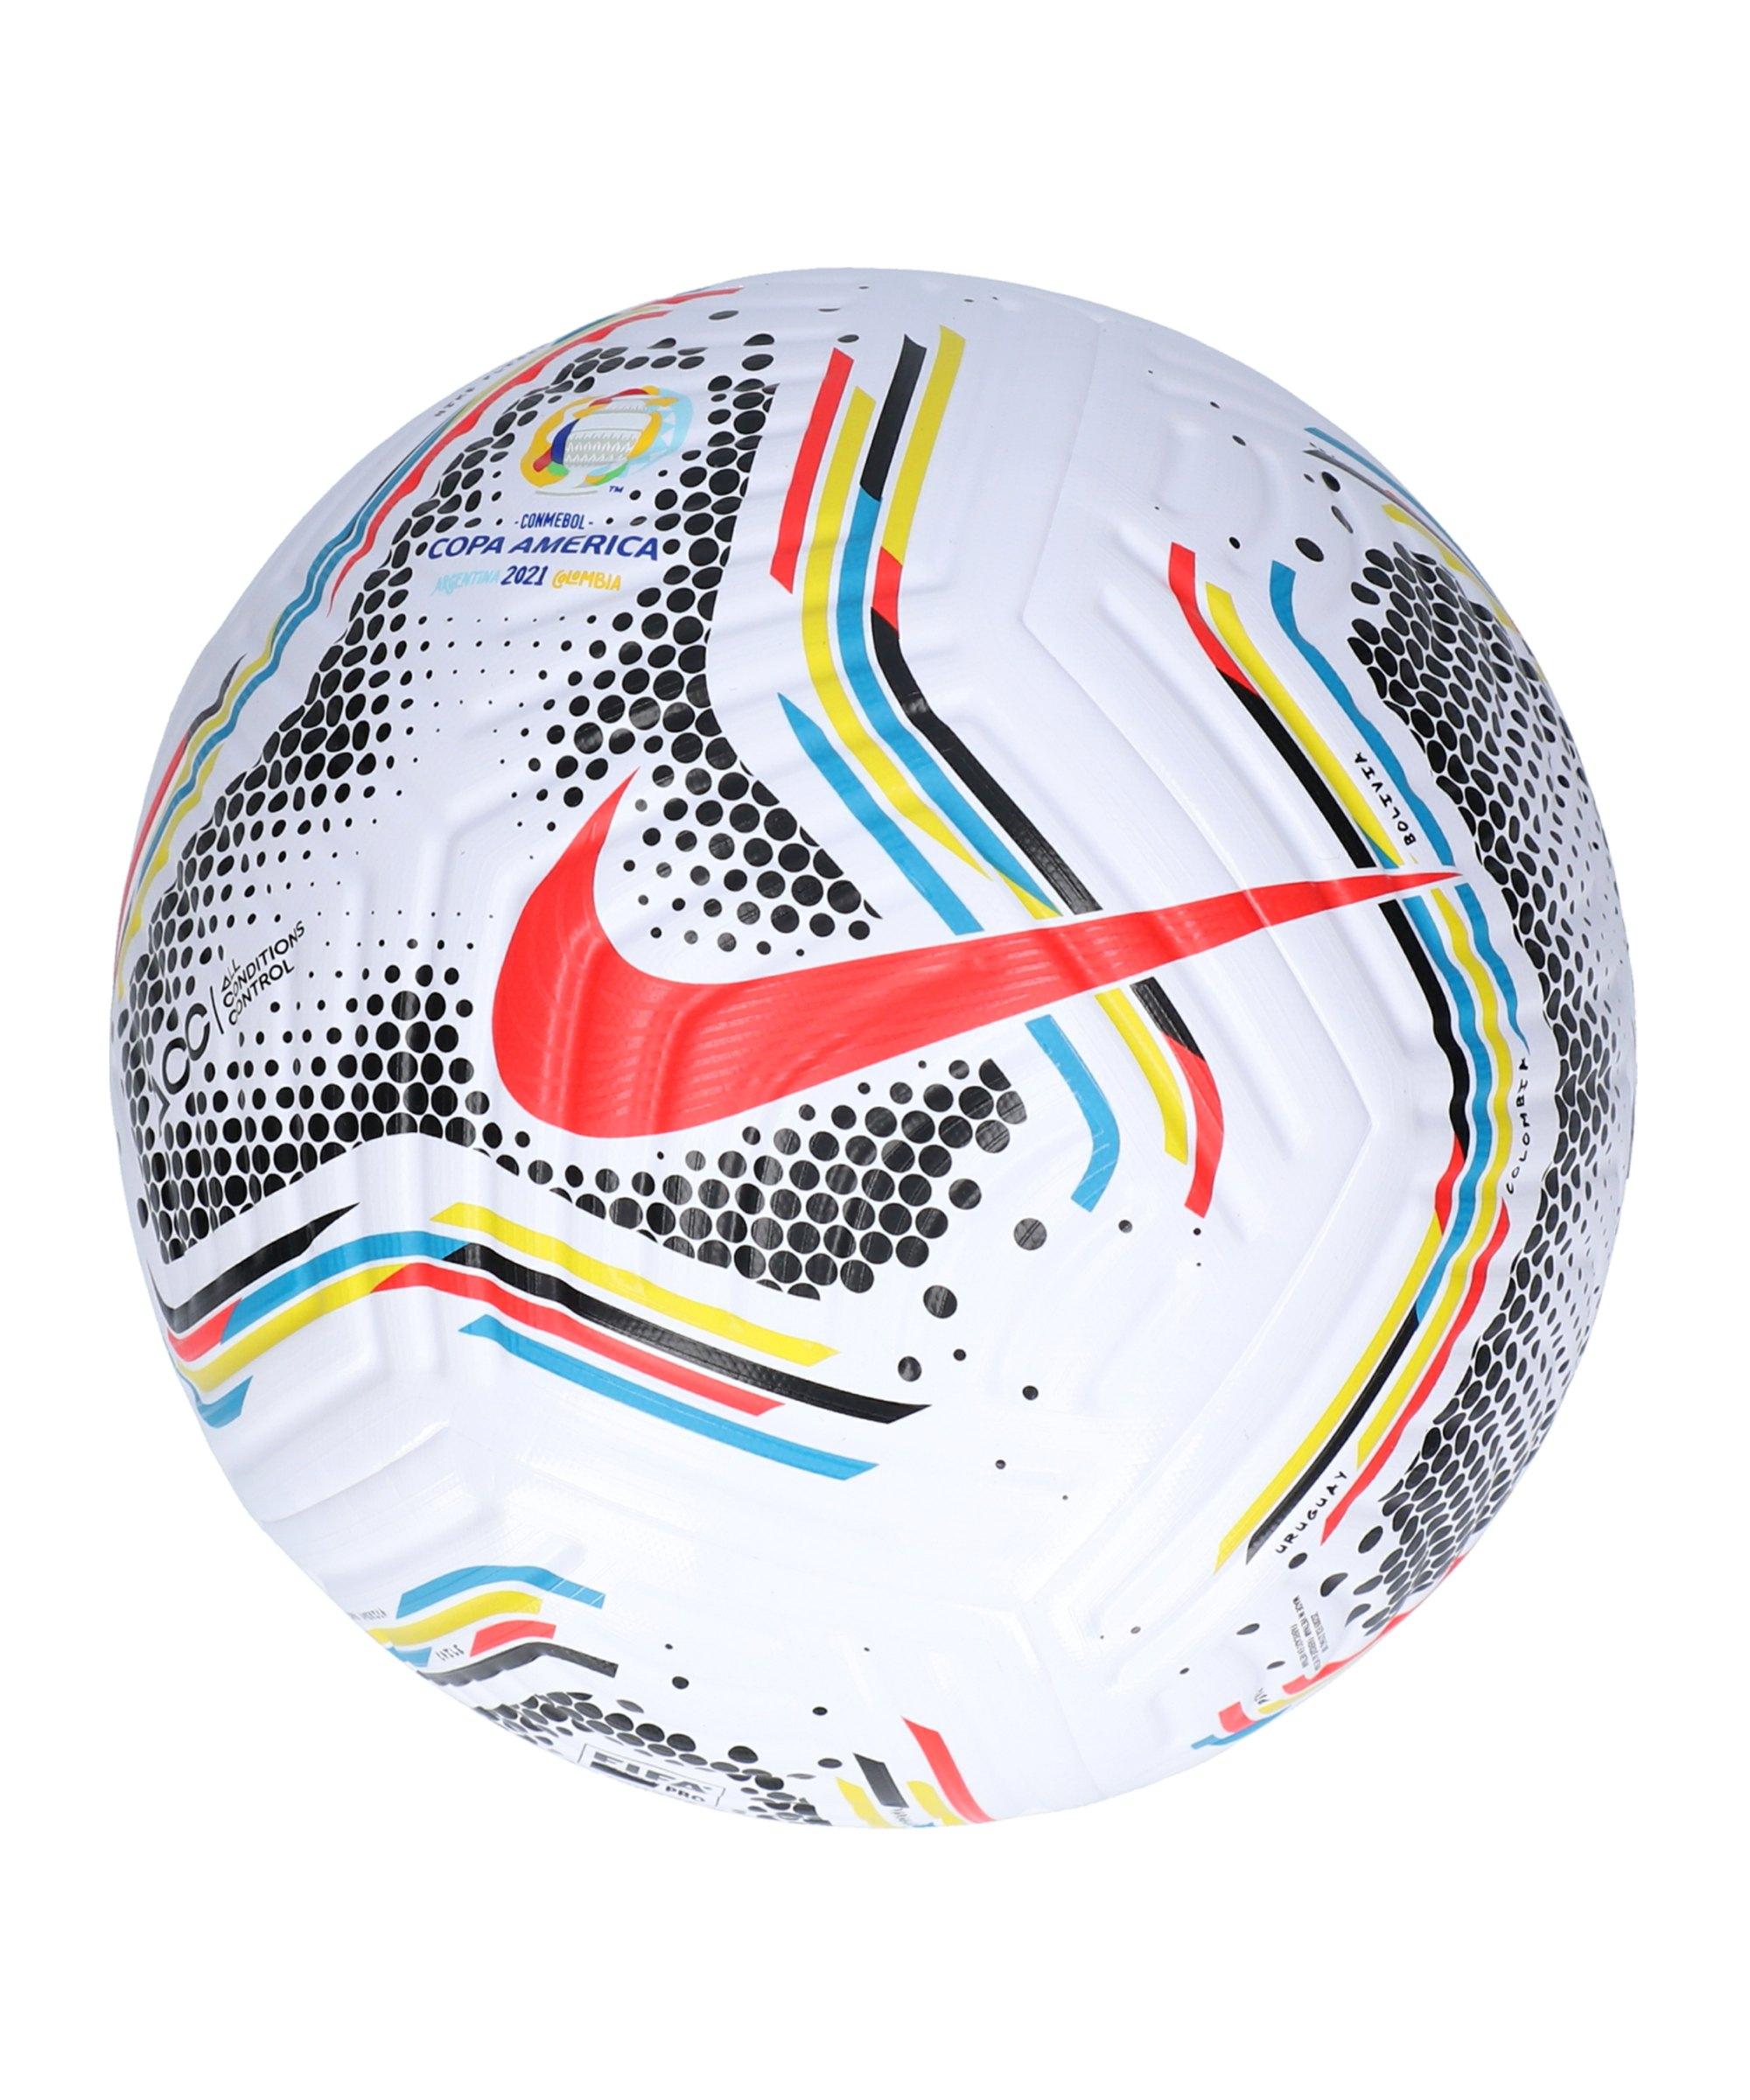 Nike Copa America Flight-21 Promo Spielball Weiss F100 - weiss